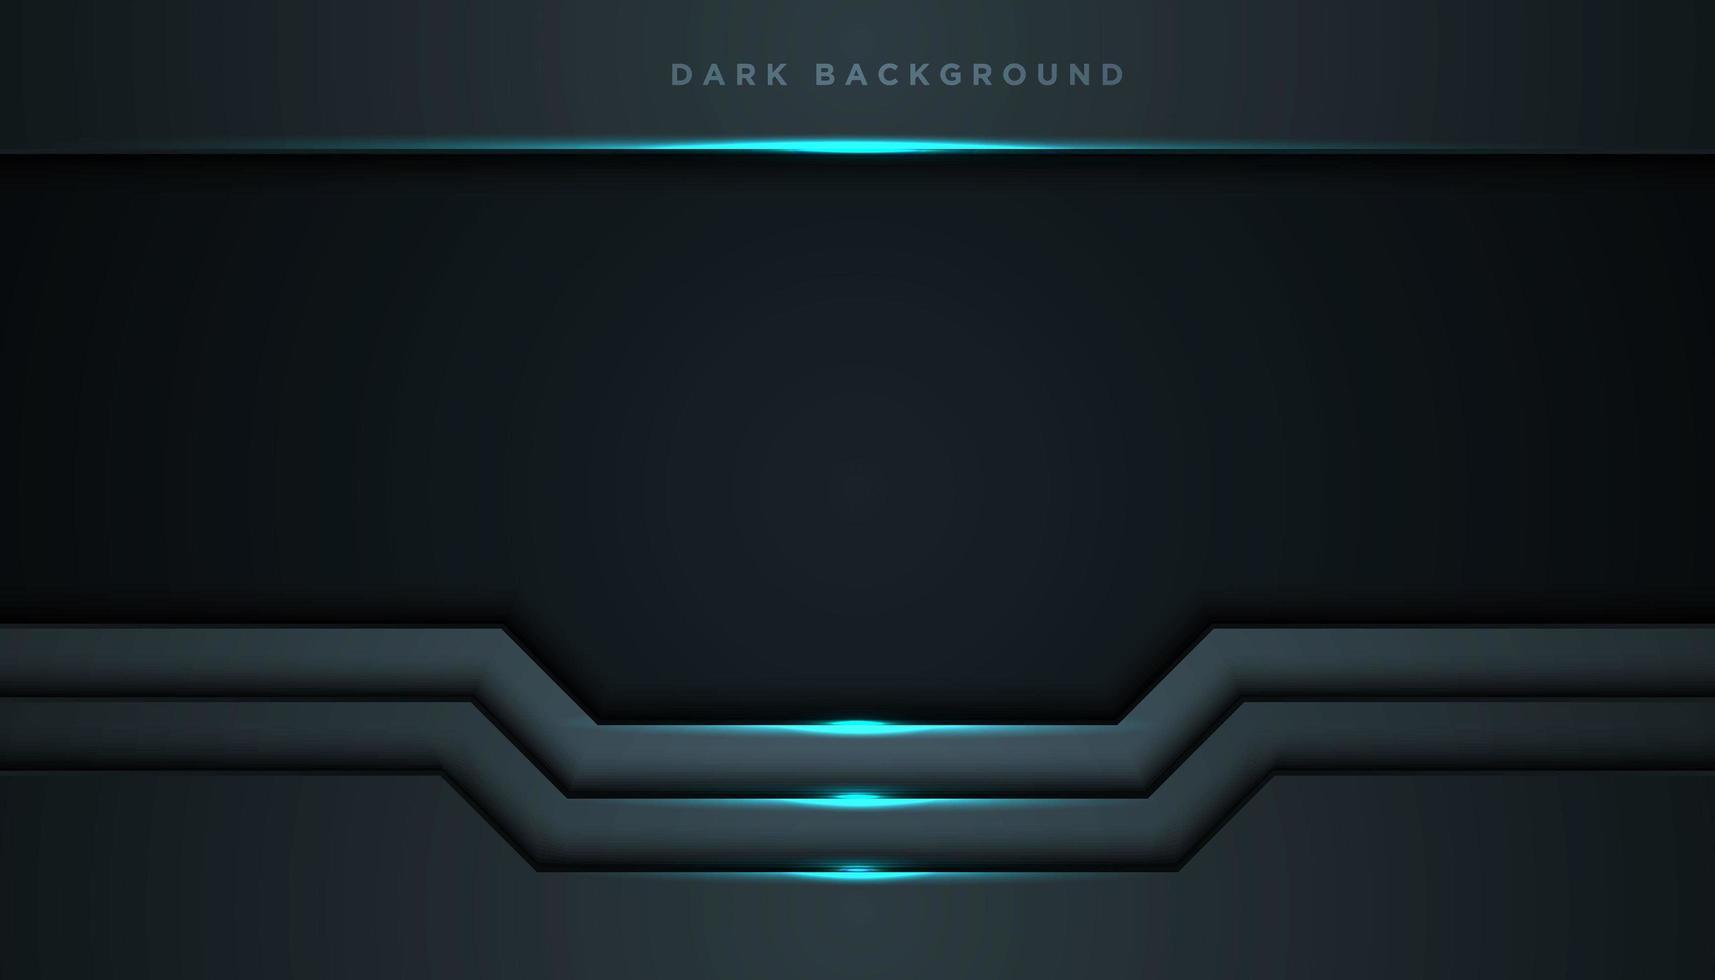 Fondo abstracto marco negro con luz azul brillante vector